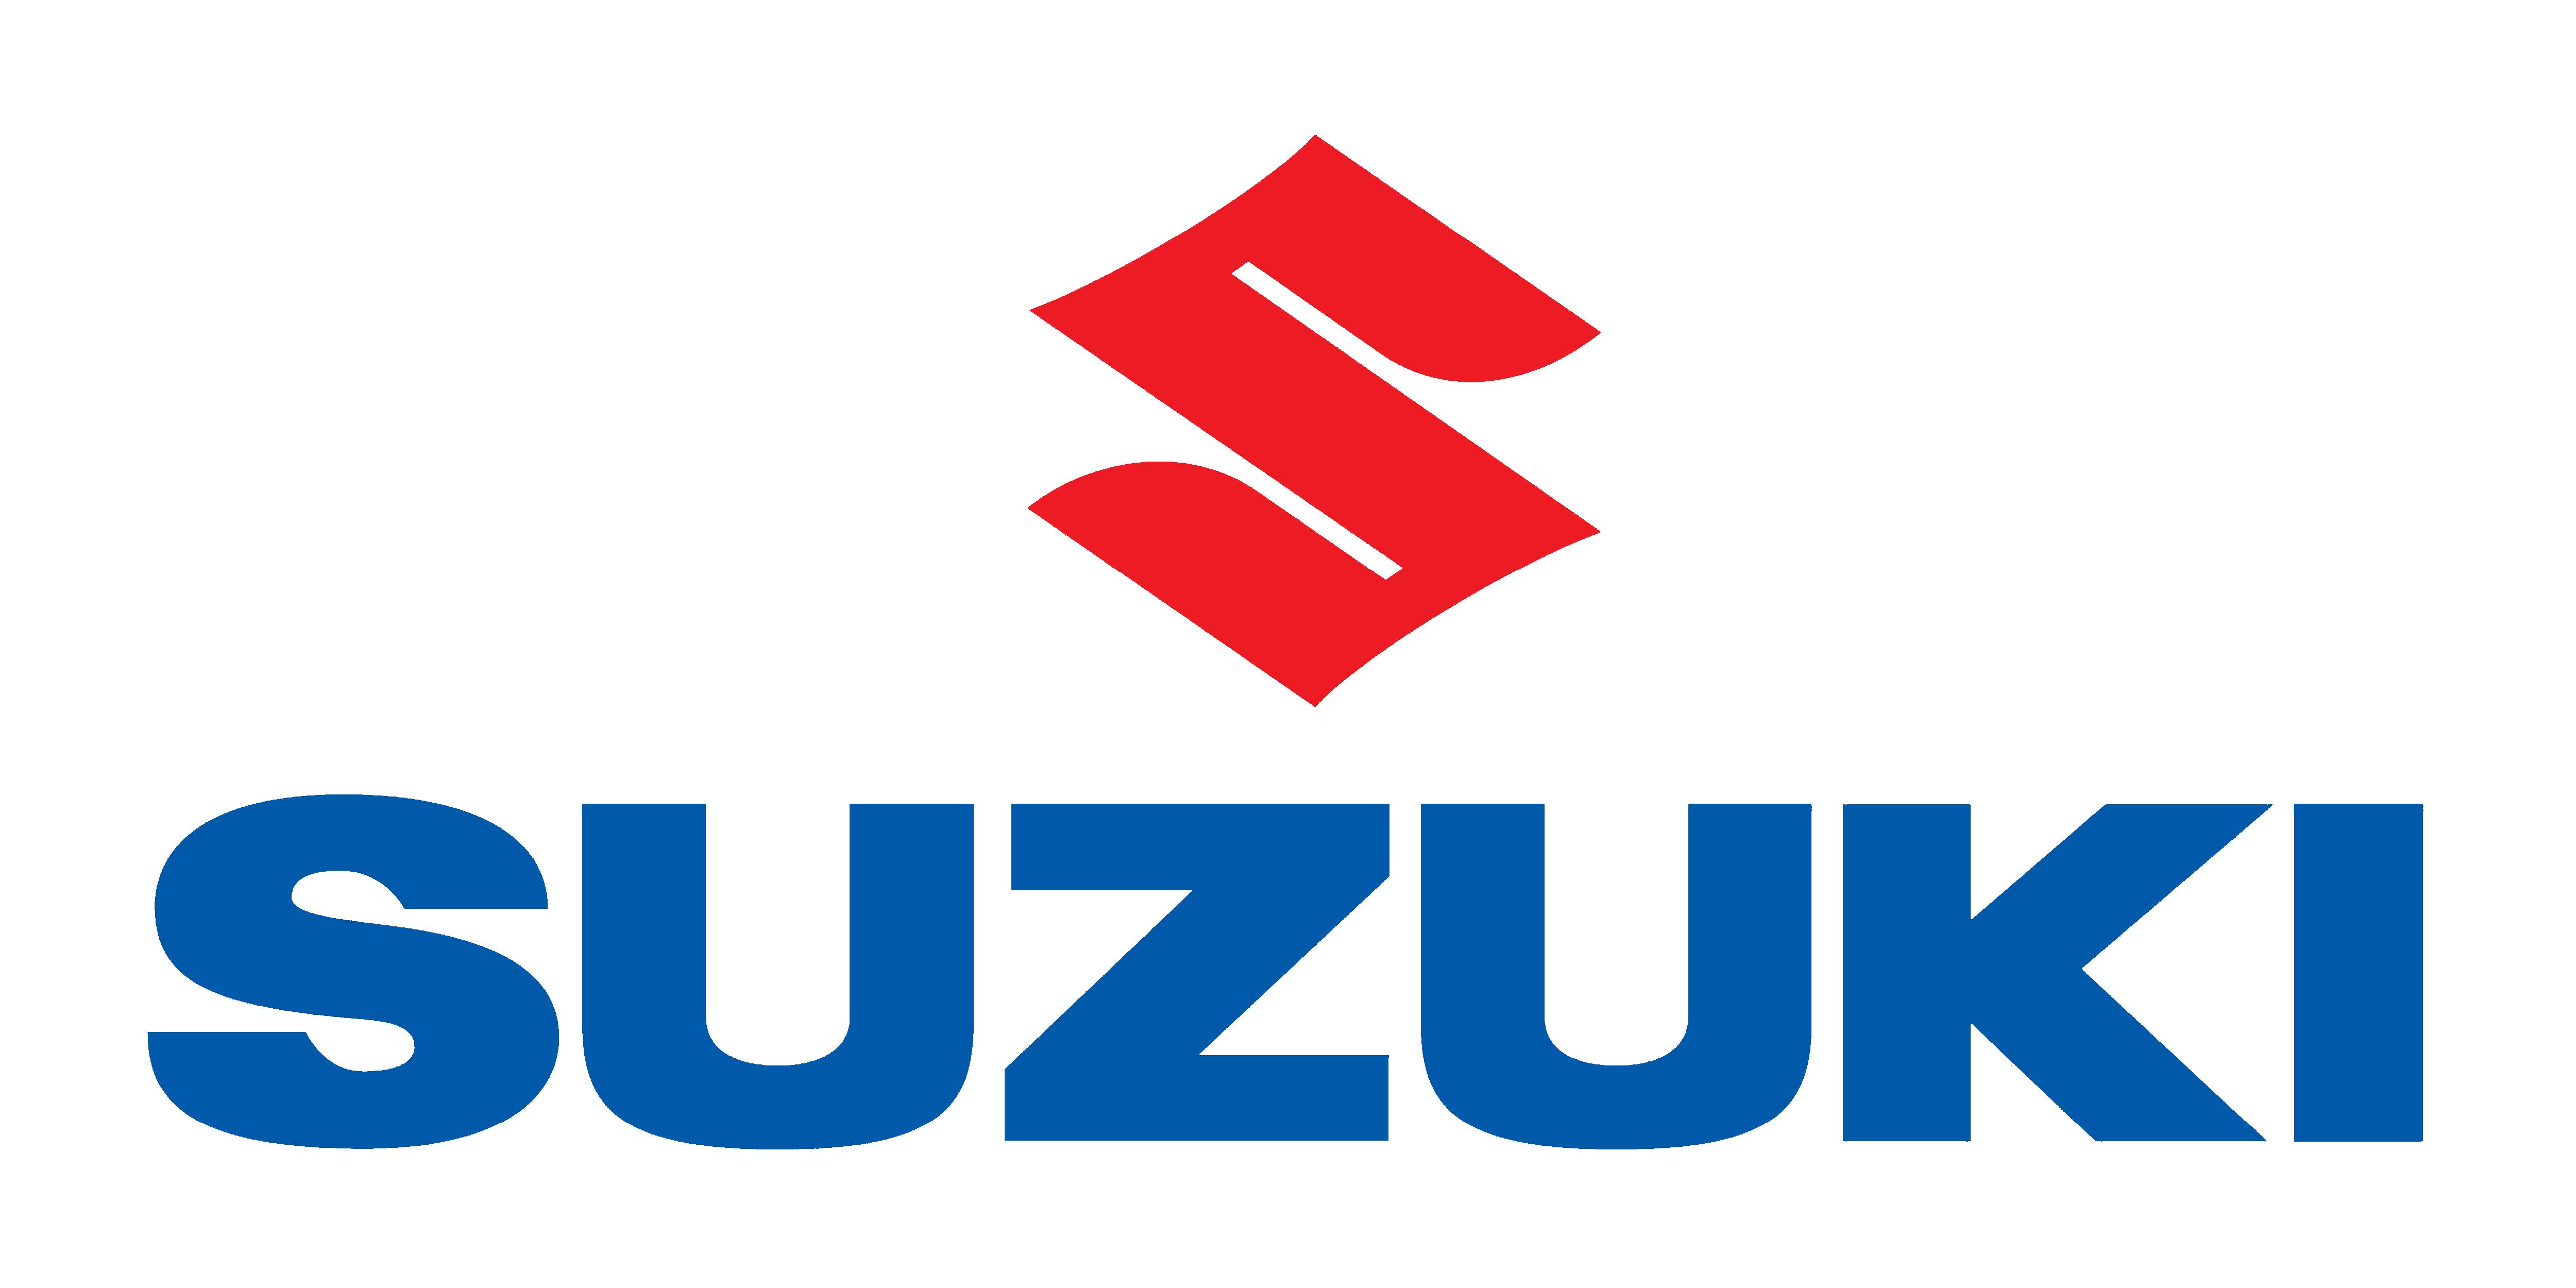 Suzuki Logo Present 6000x5000 HD Png